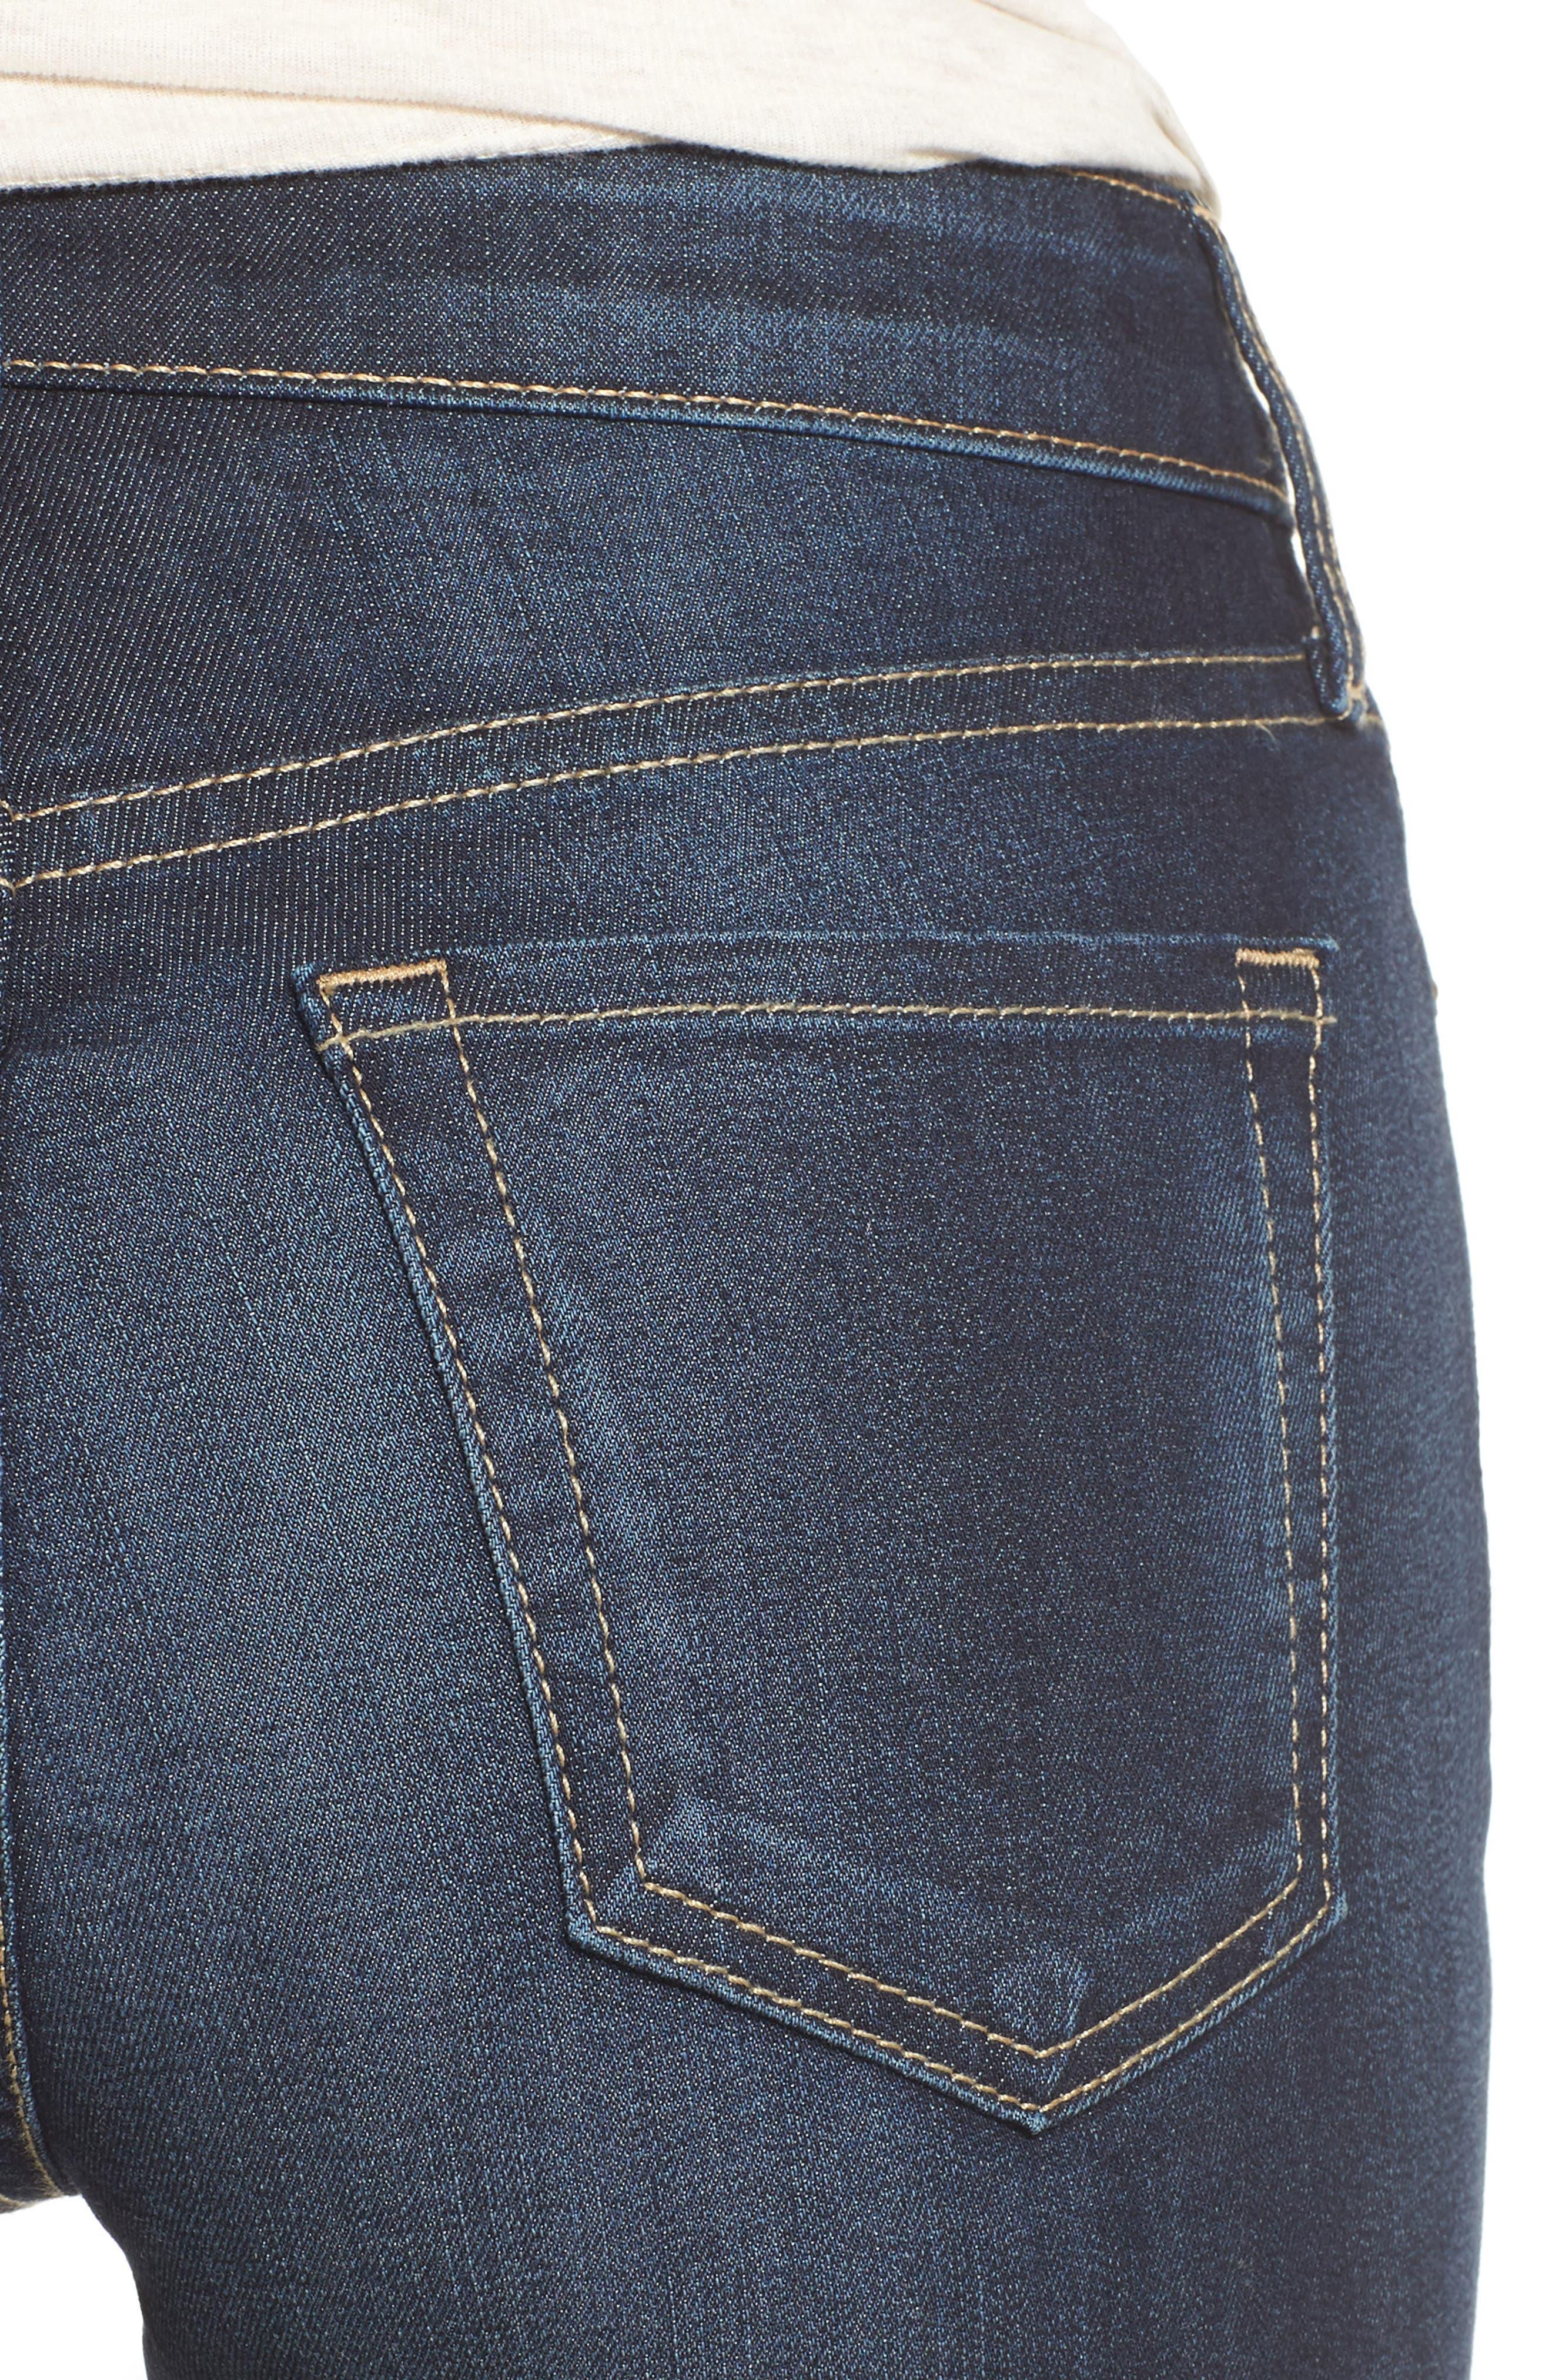 Natalie Curvy Fit Bootleg Jeans,                             Alternate thumbnail 4, color,                             434